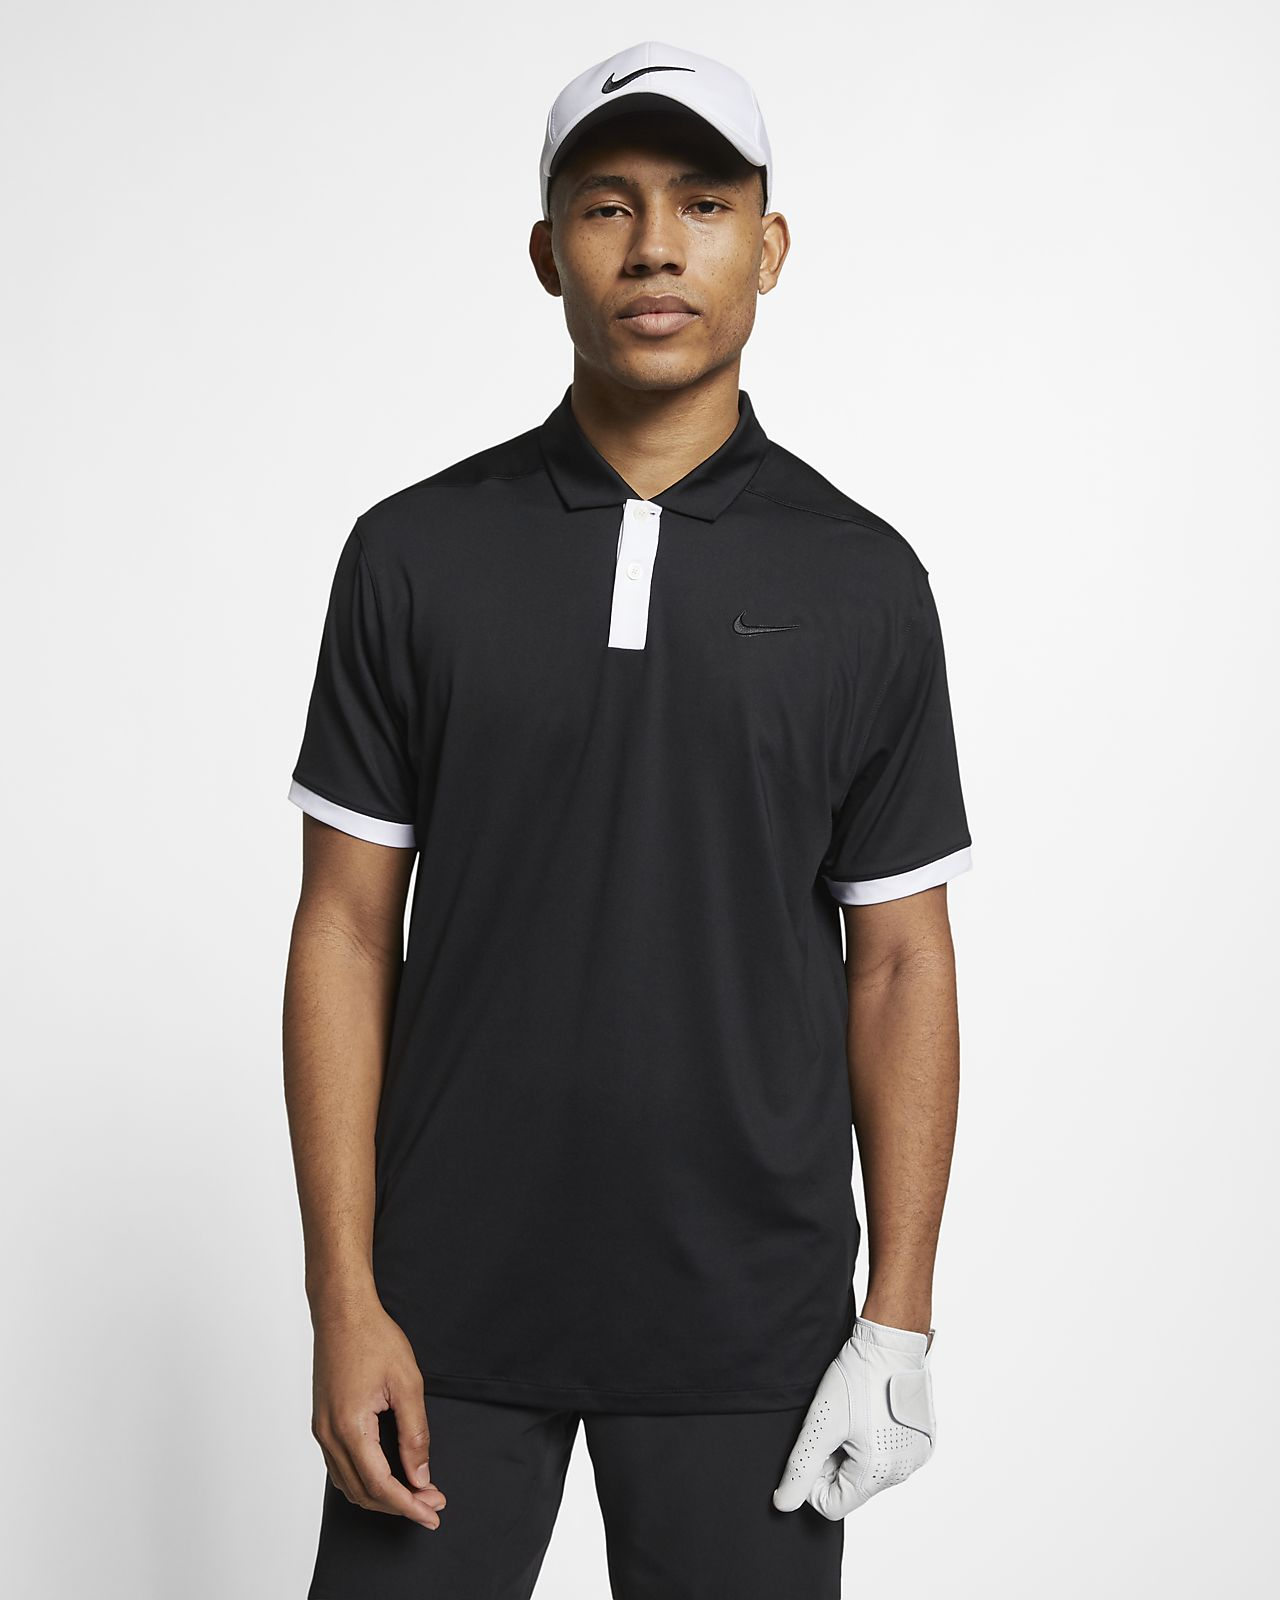 Nike Dri-FIT Vapor férfi golfpóló